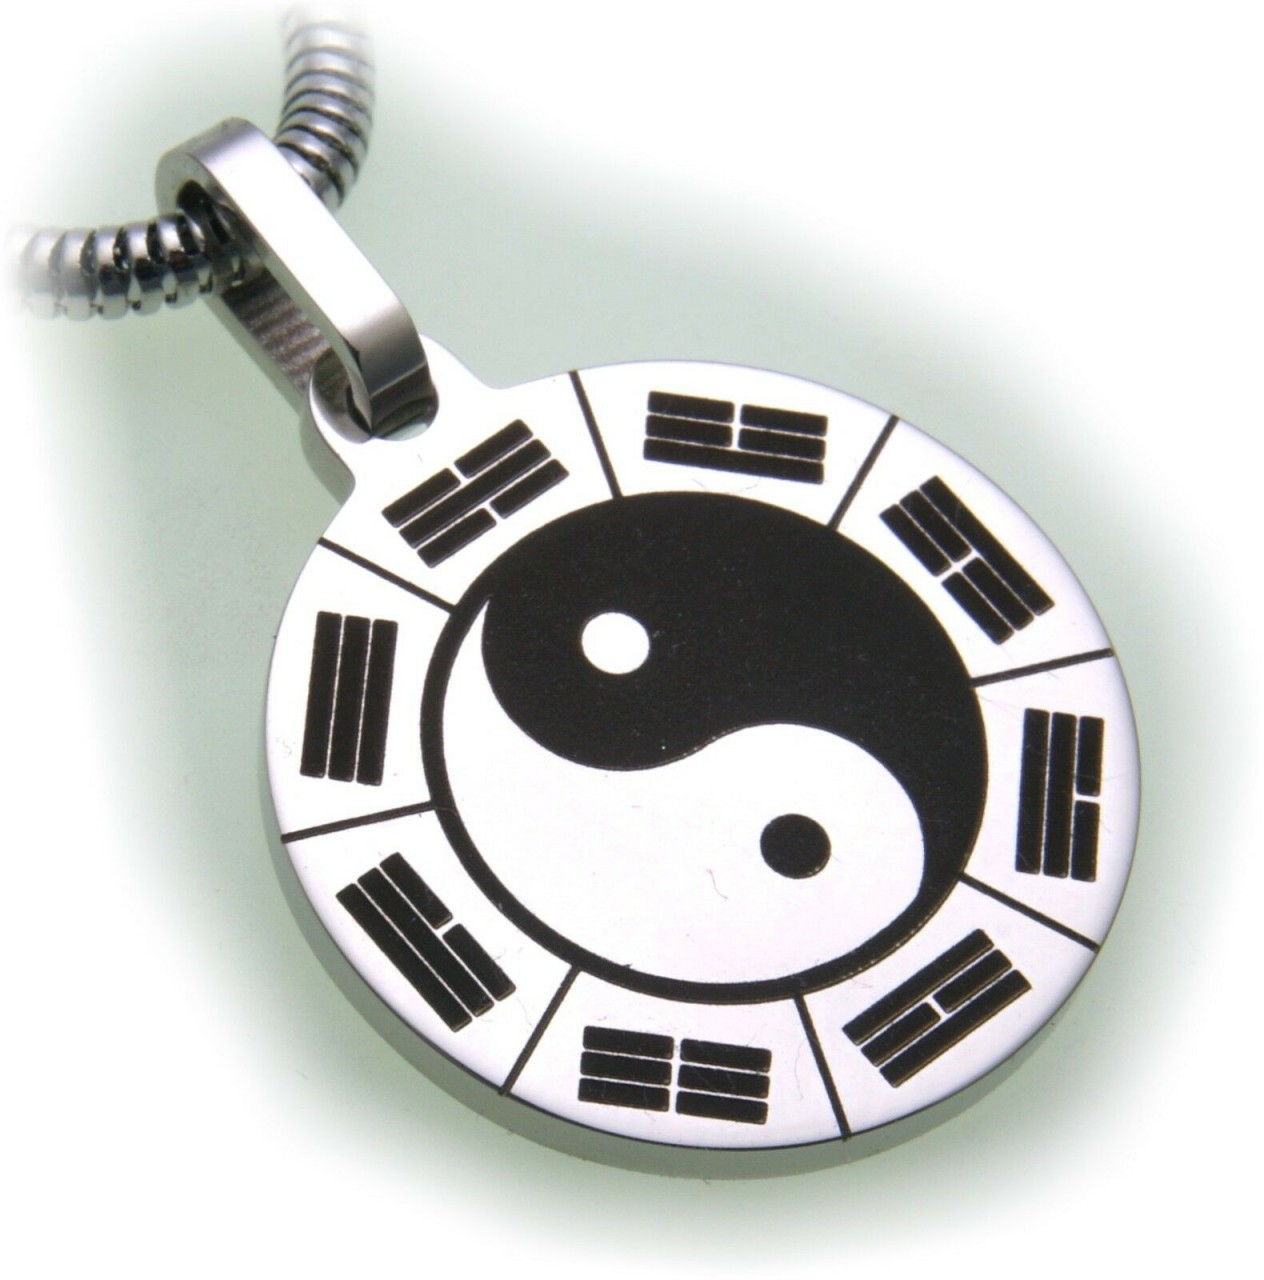 Anhänger Yin Yang Edelstahl schwarz weiß Hardwear by Landmesser Qualität Yang